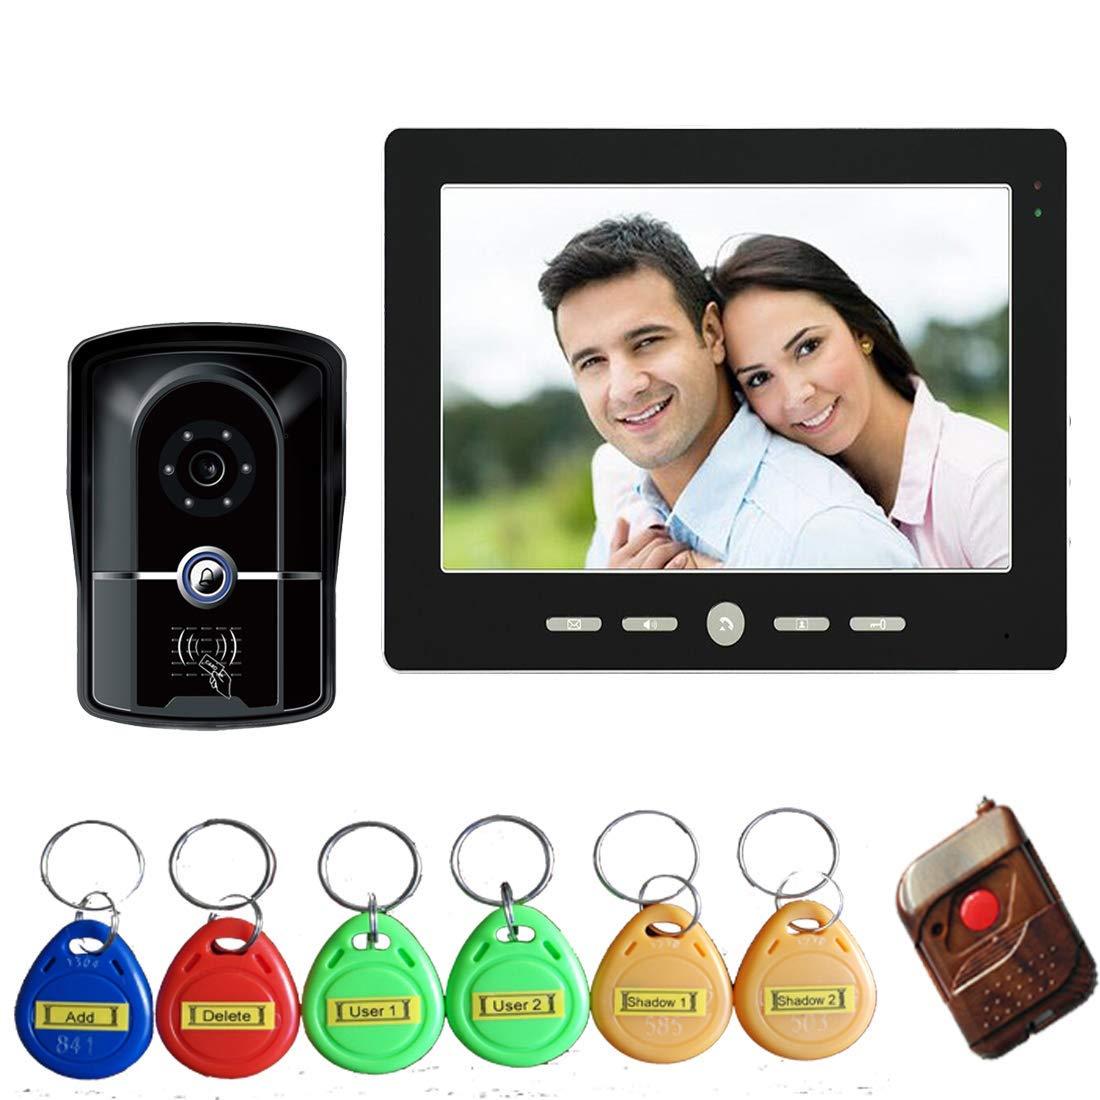 JINPENGPEN 10 inch Intelligent Video doorbell Remote intercom Access Control System HD 1000TVL Infrared Camera,1/1